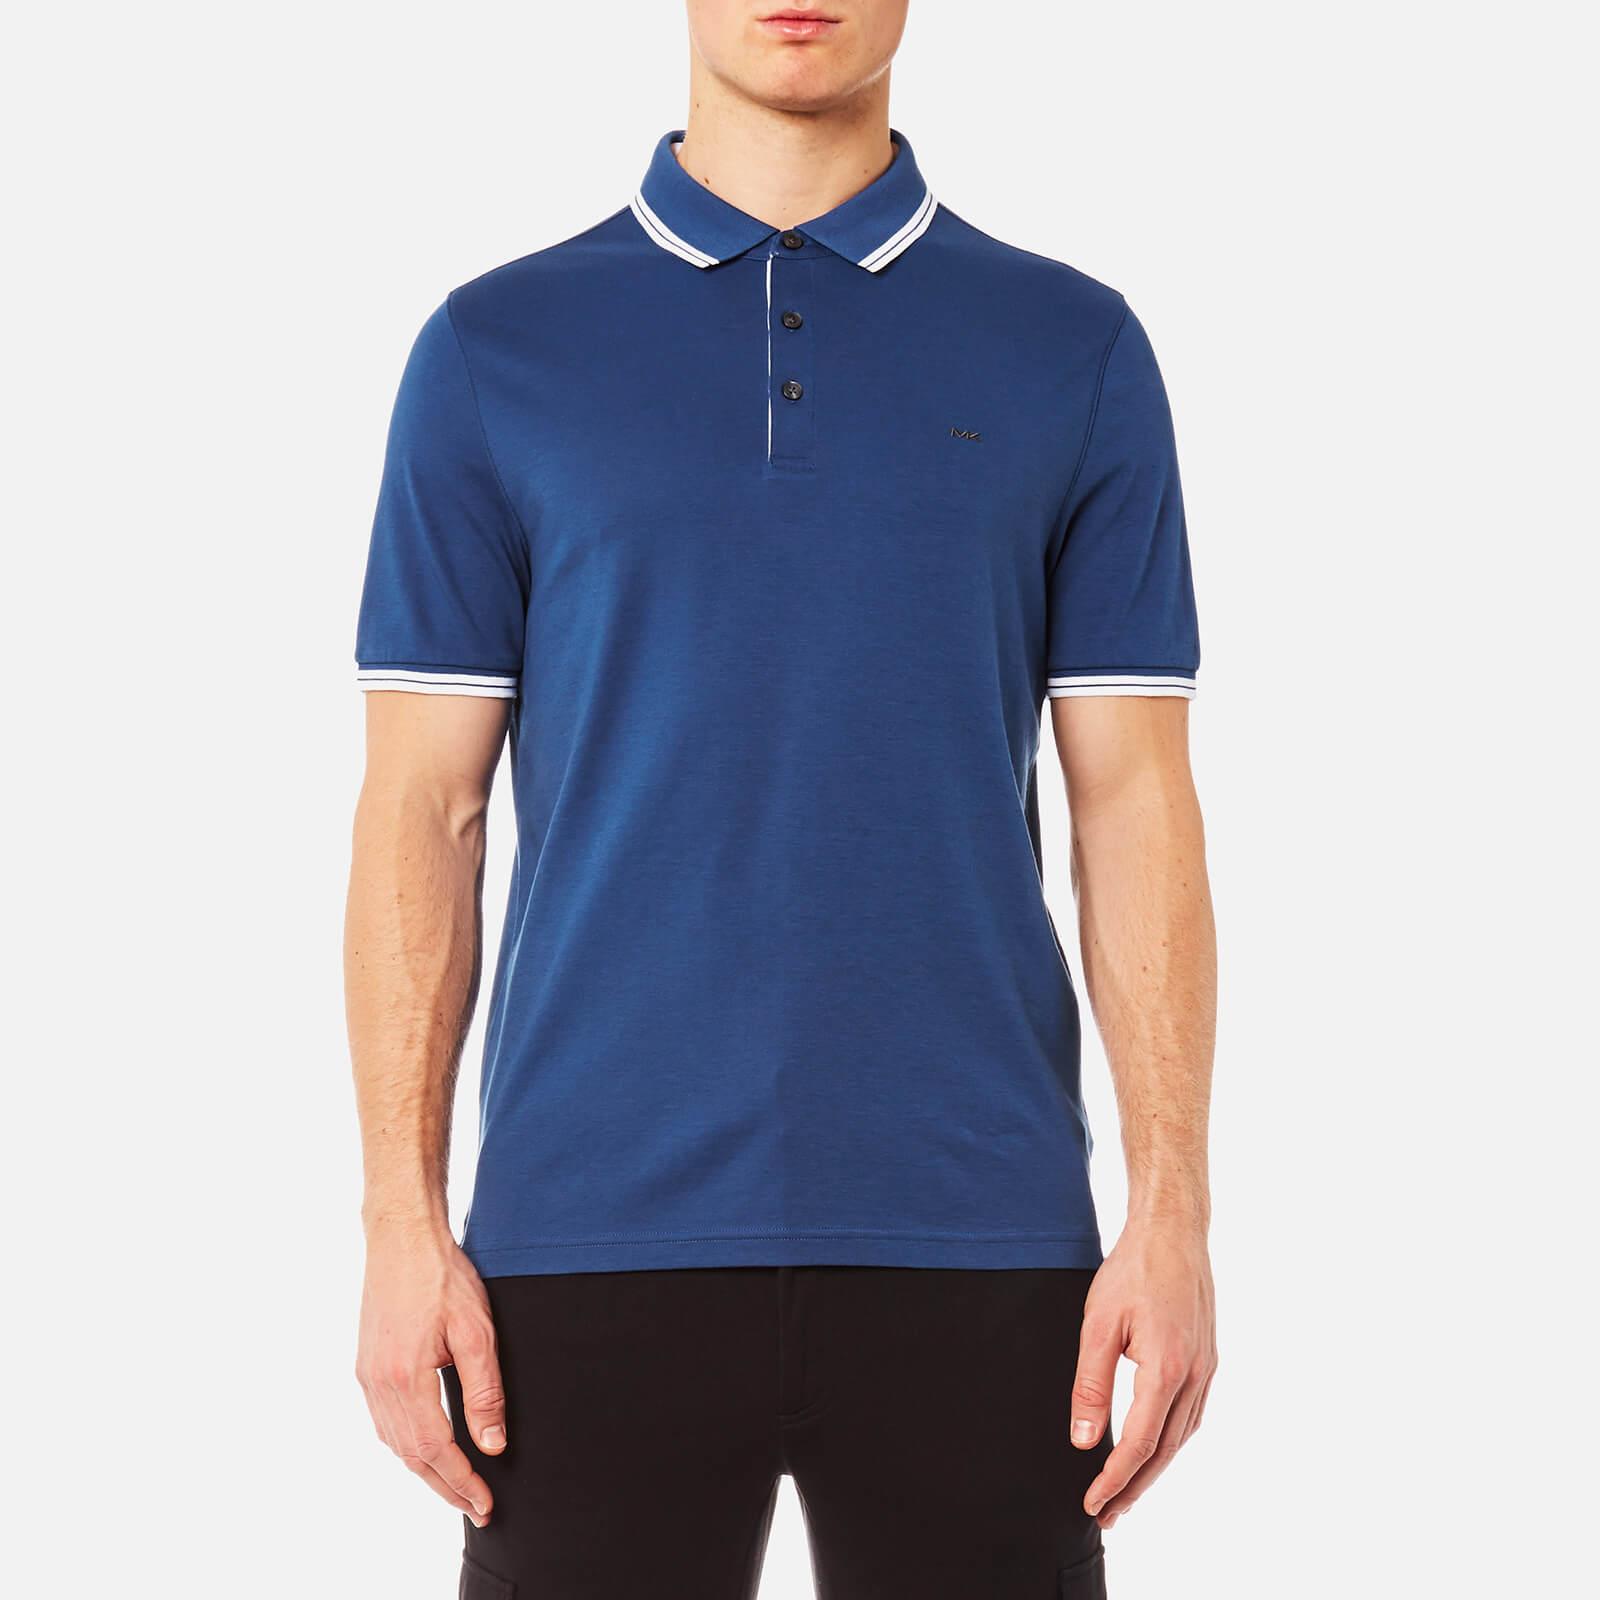 d8b58b20 Michael Kors Men's Logo Collar Polo Shirt - Marine Blue - Free UK ...